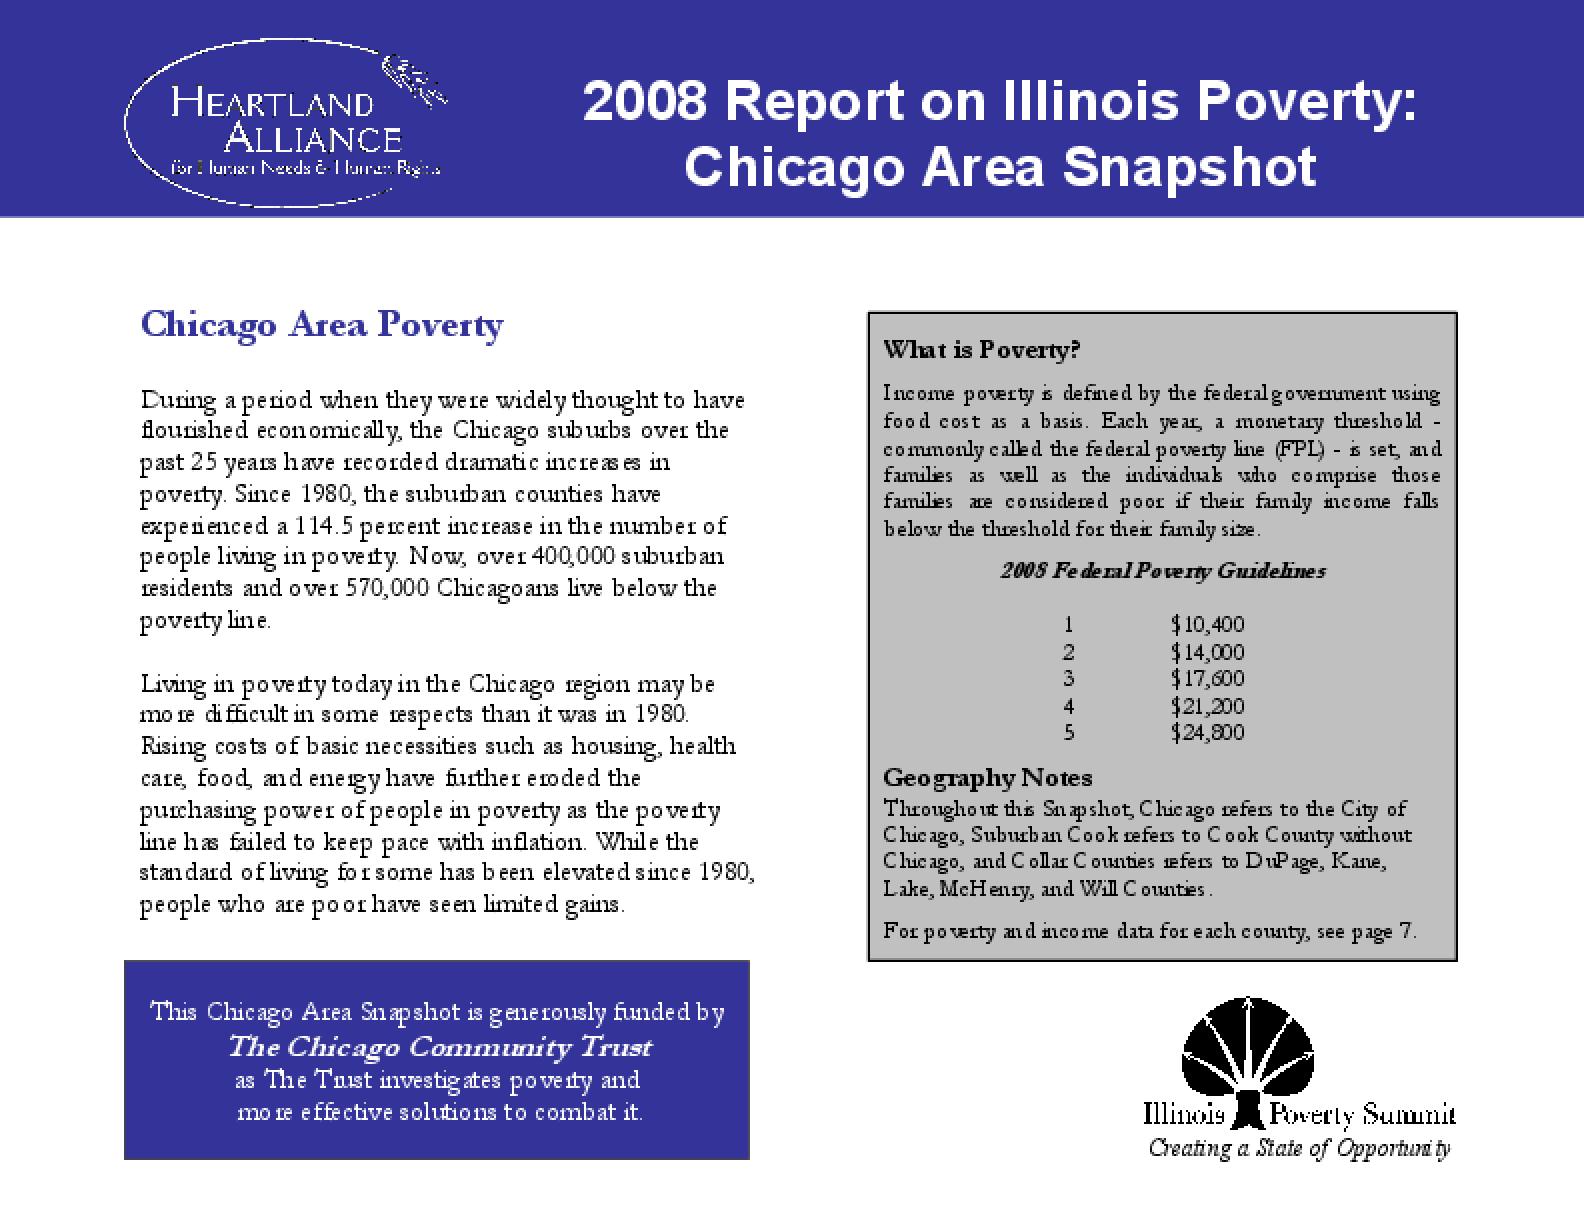 2008 Report on Illinois Poverty: Chicago Area Snapshot